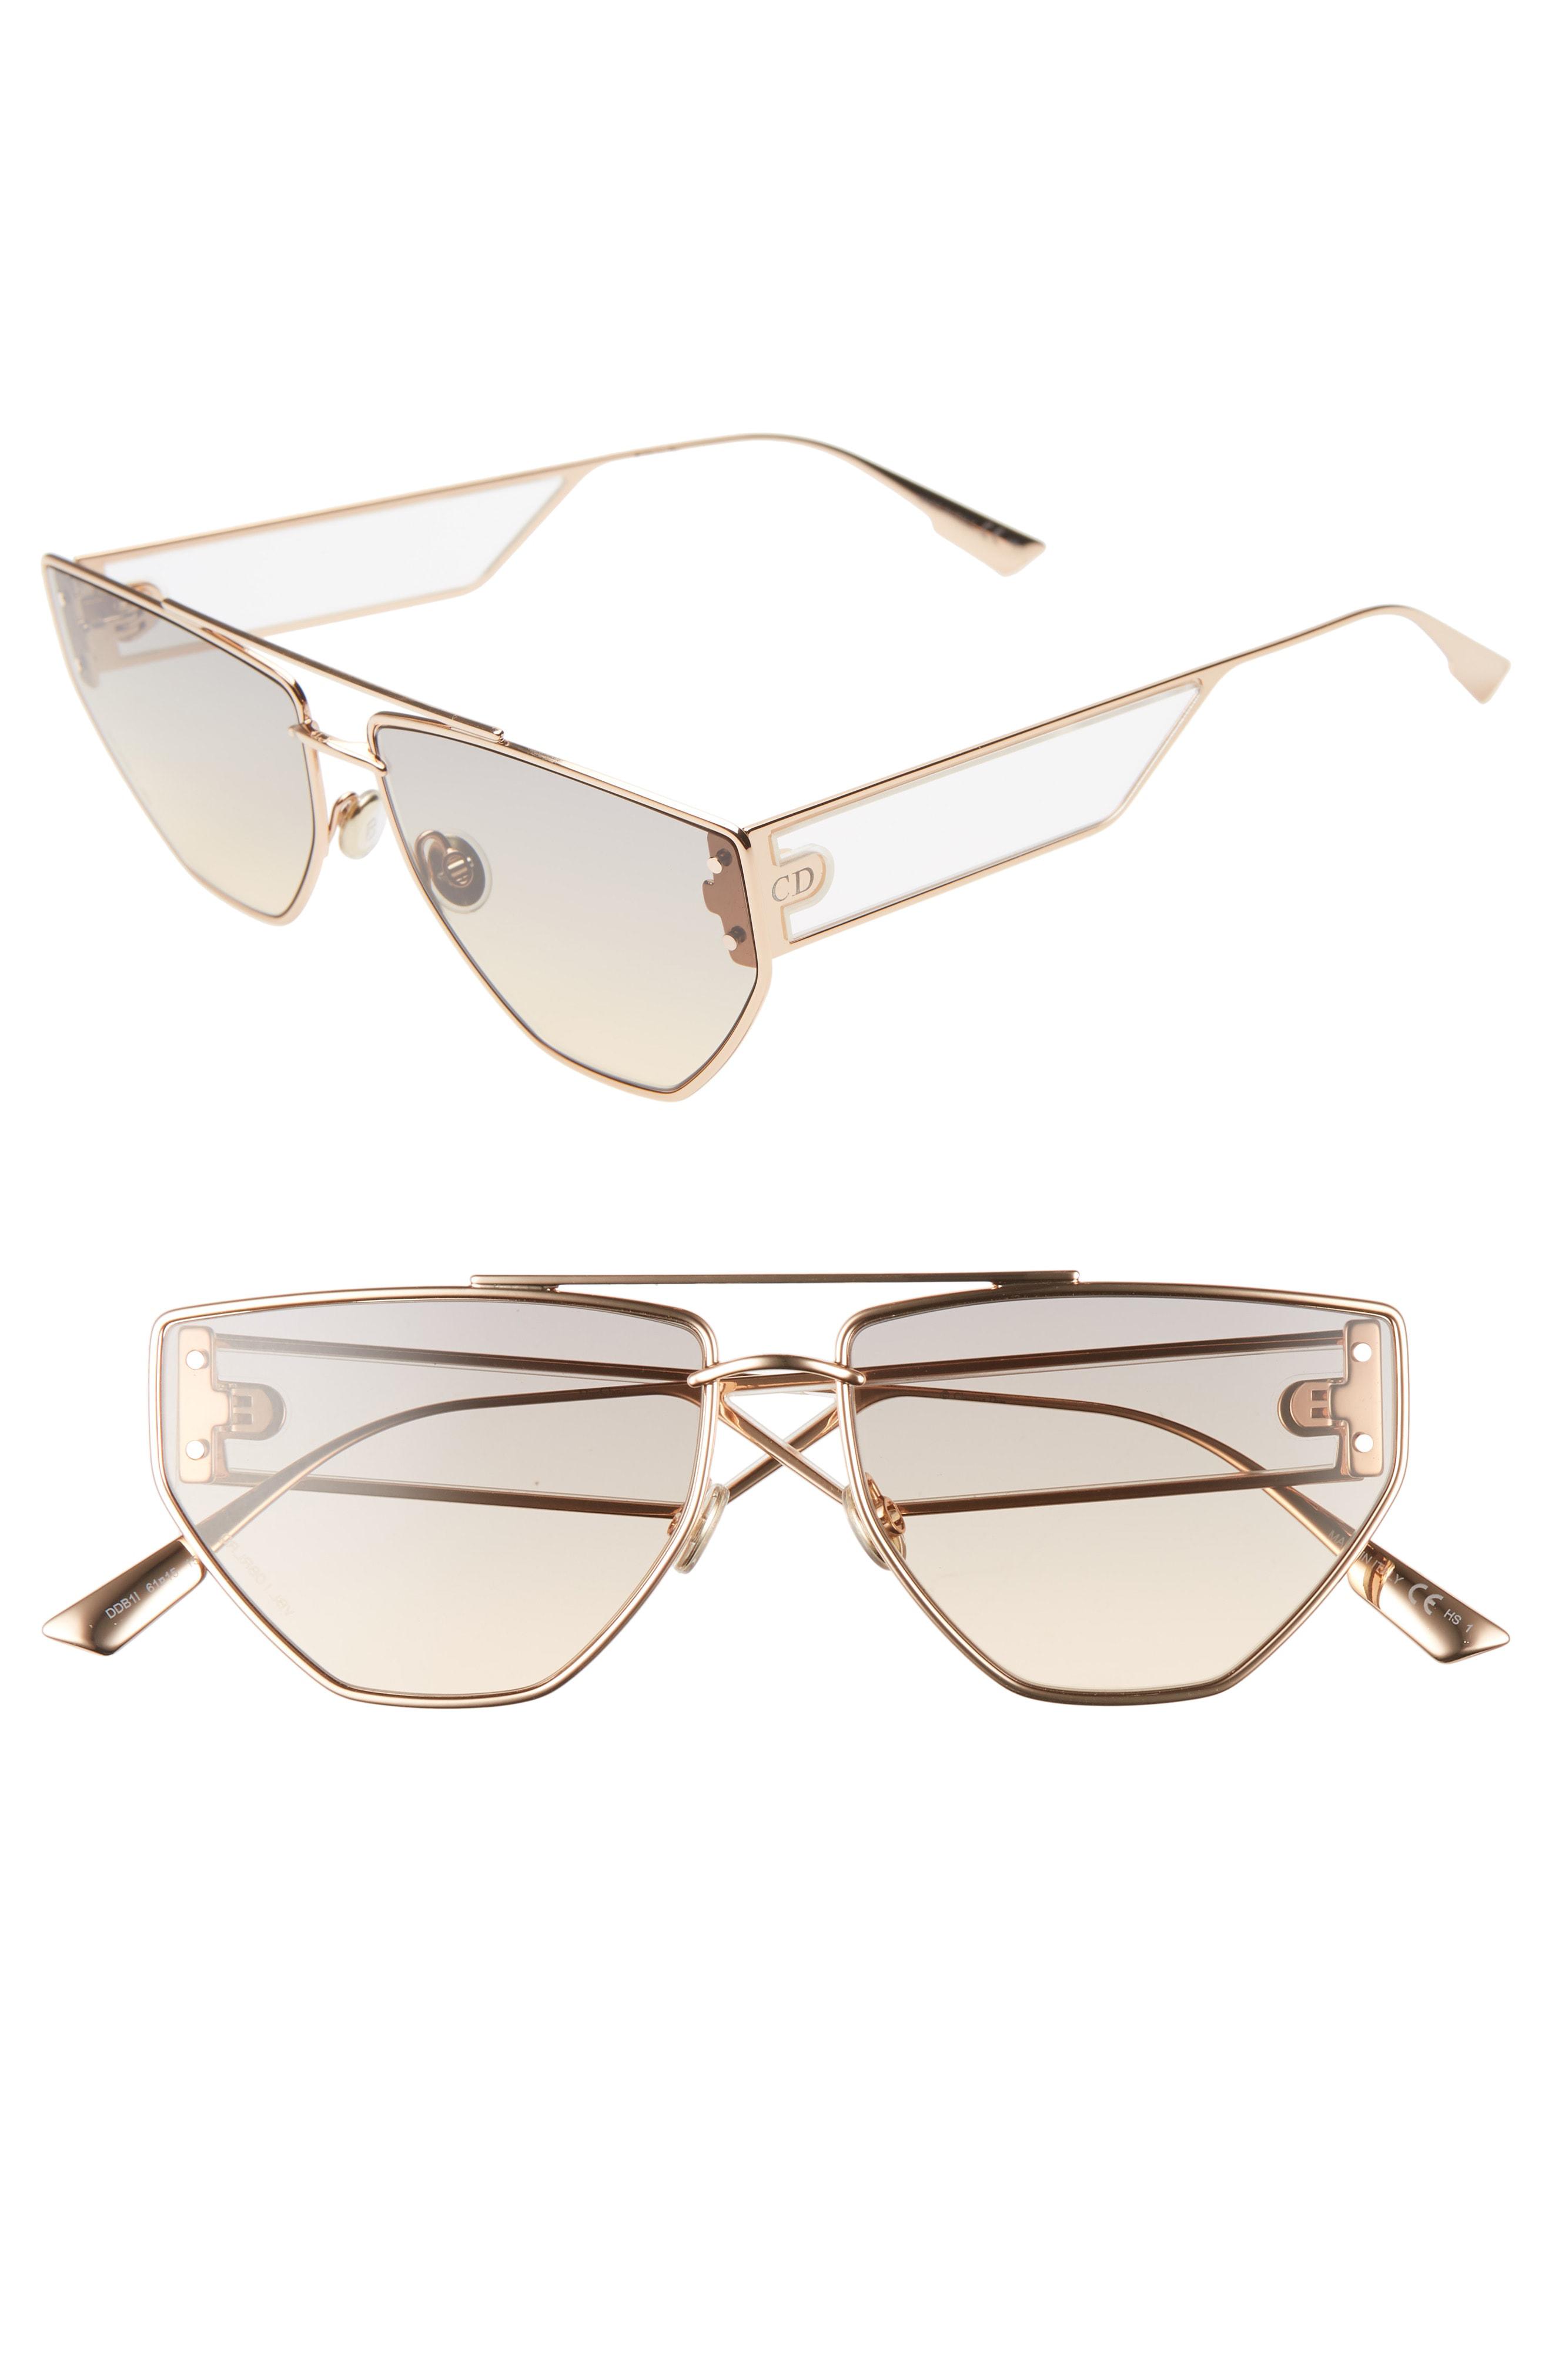 94513725feb Dior Clan 2 61Mm Aviator Sunglasses - Gold Copper  Light Gradient ...